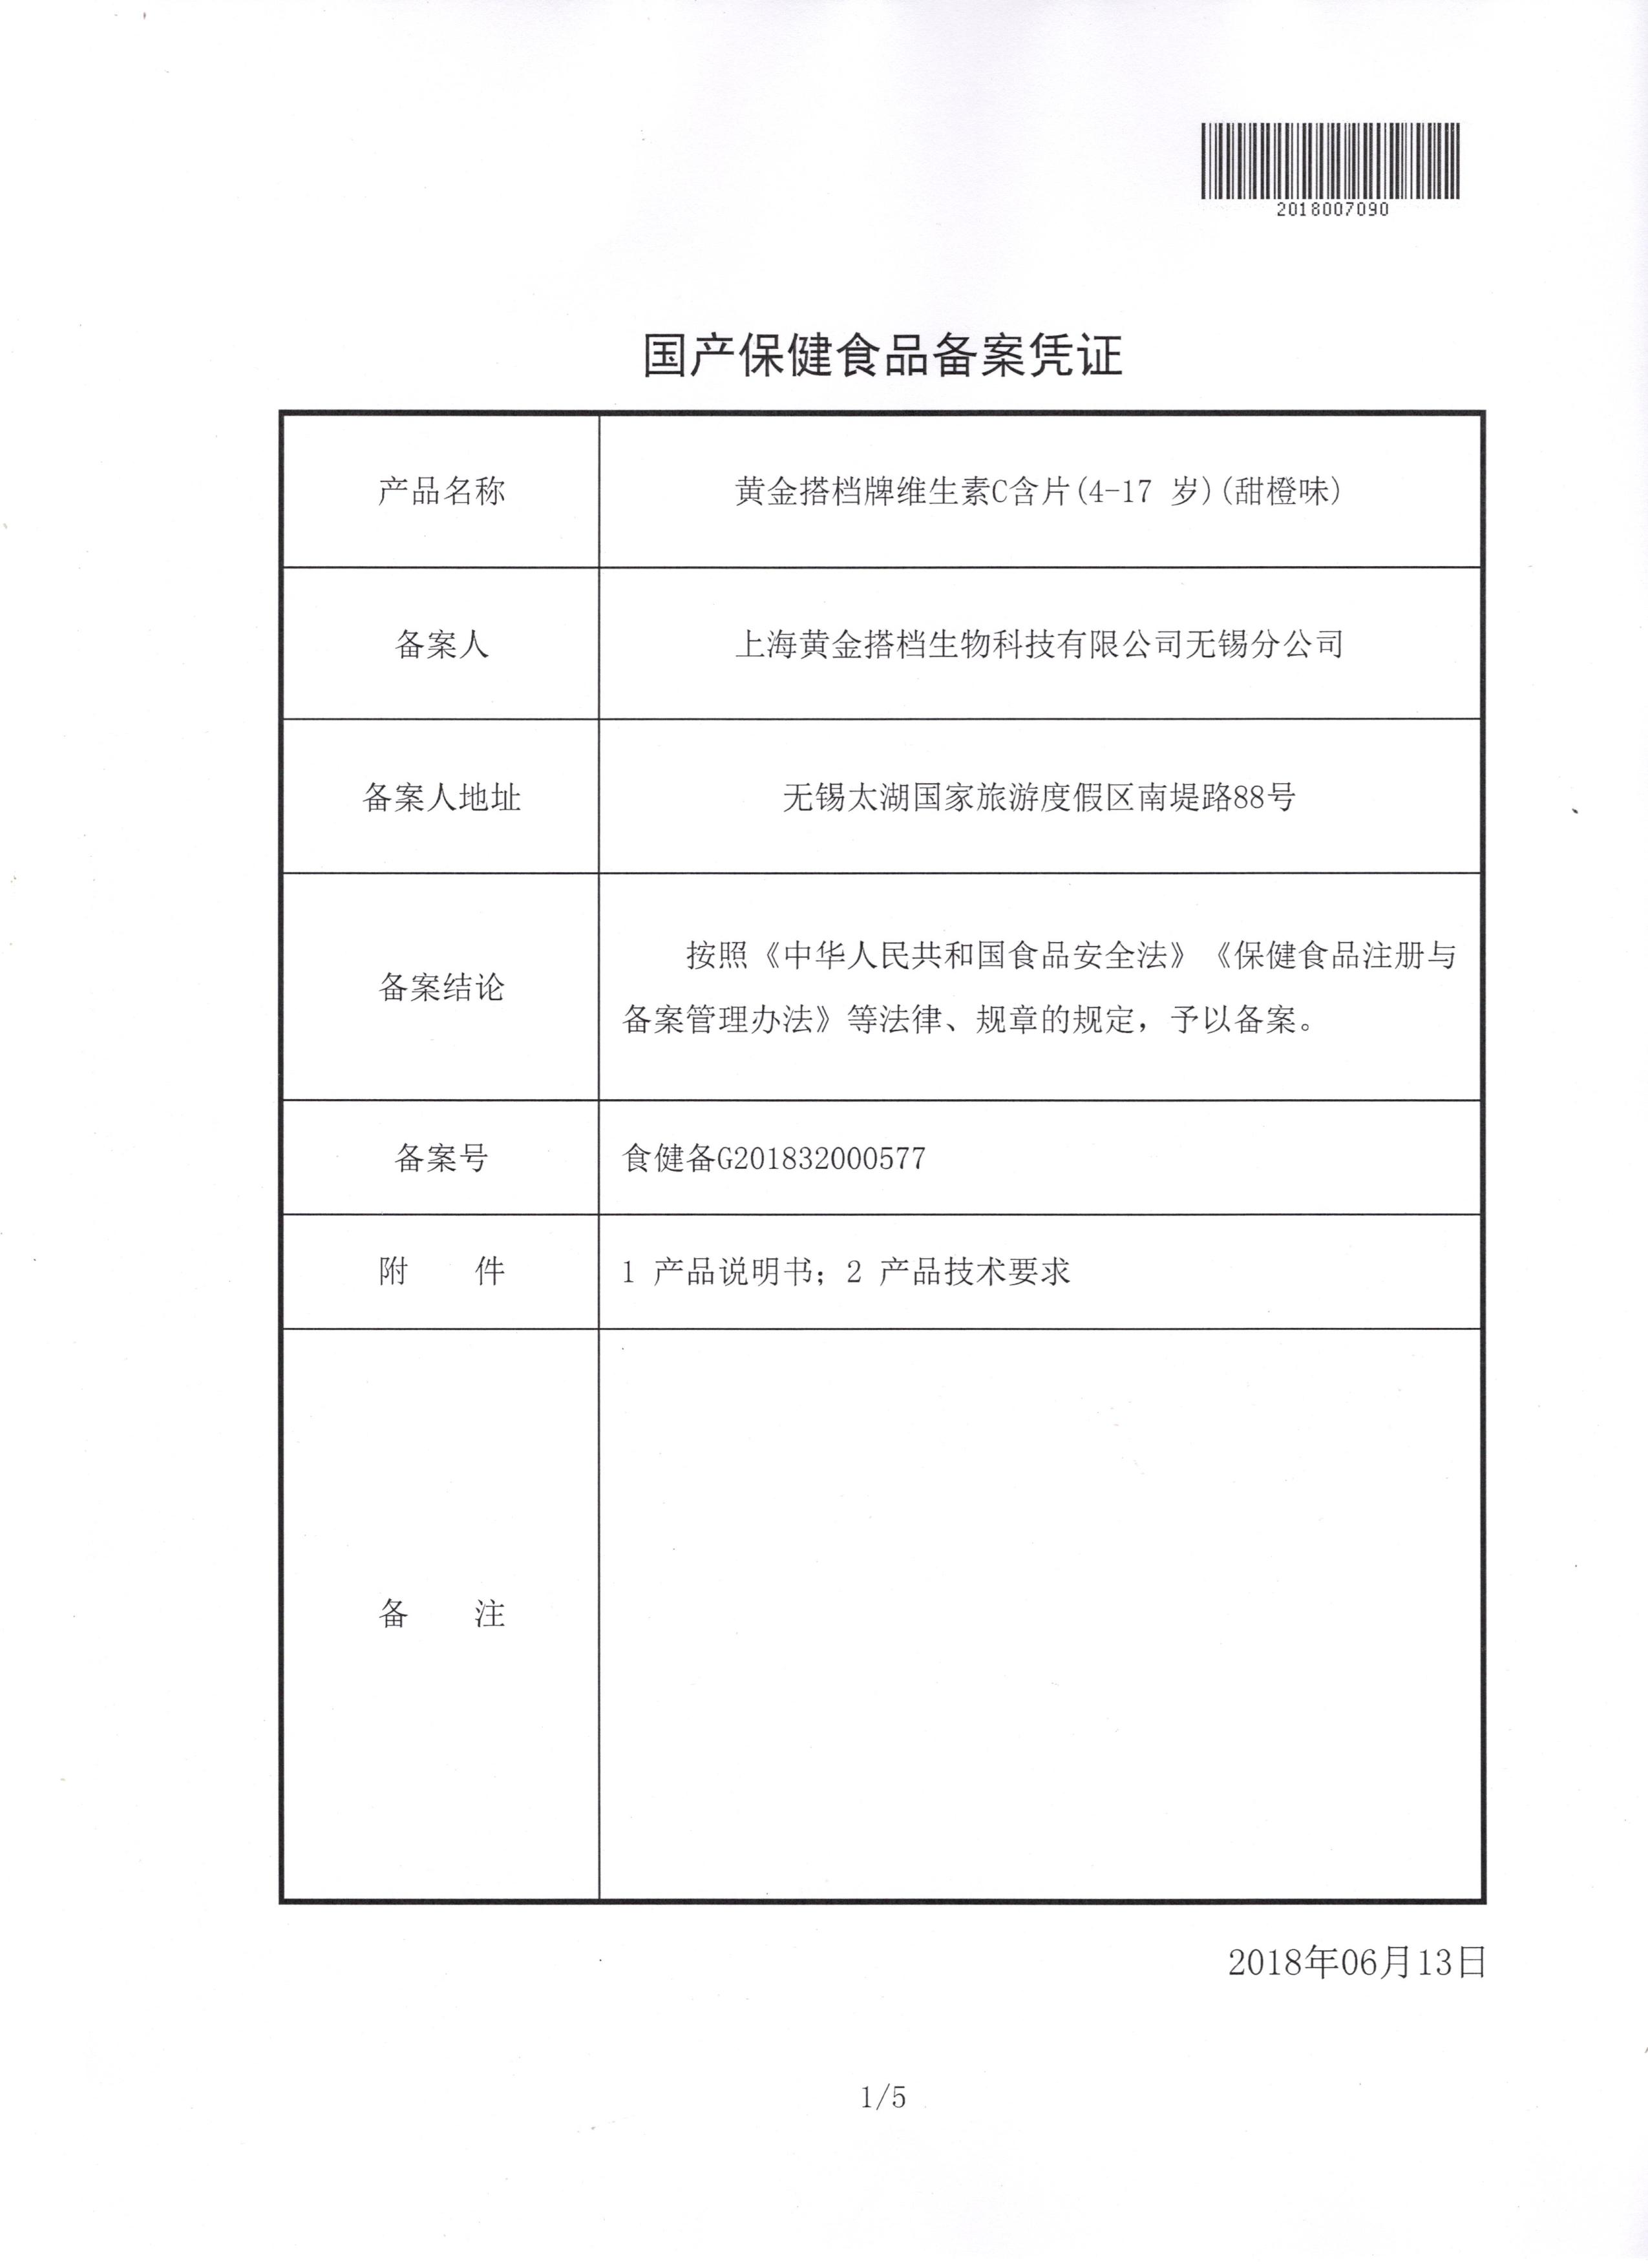 VC4-17备案凭证_1